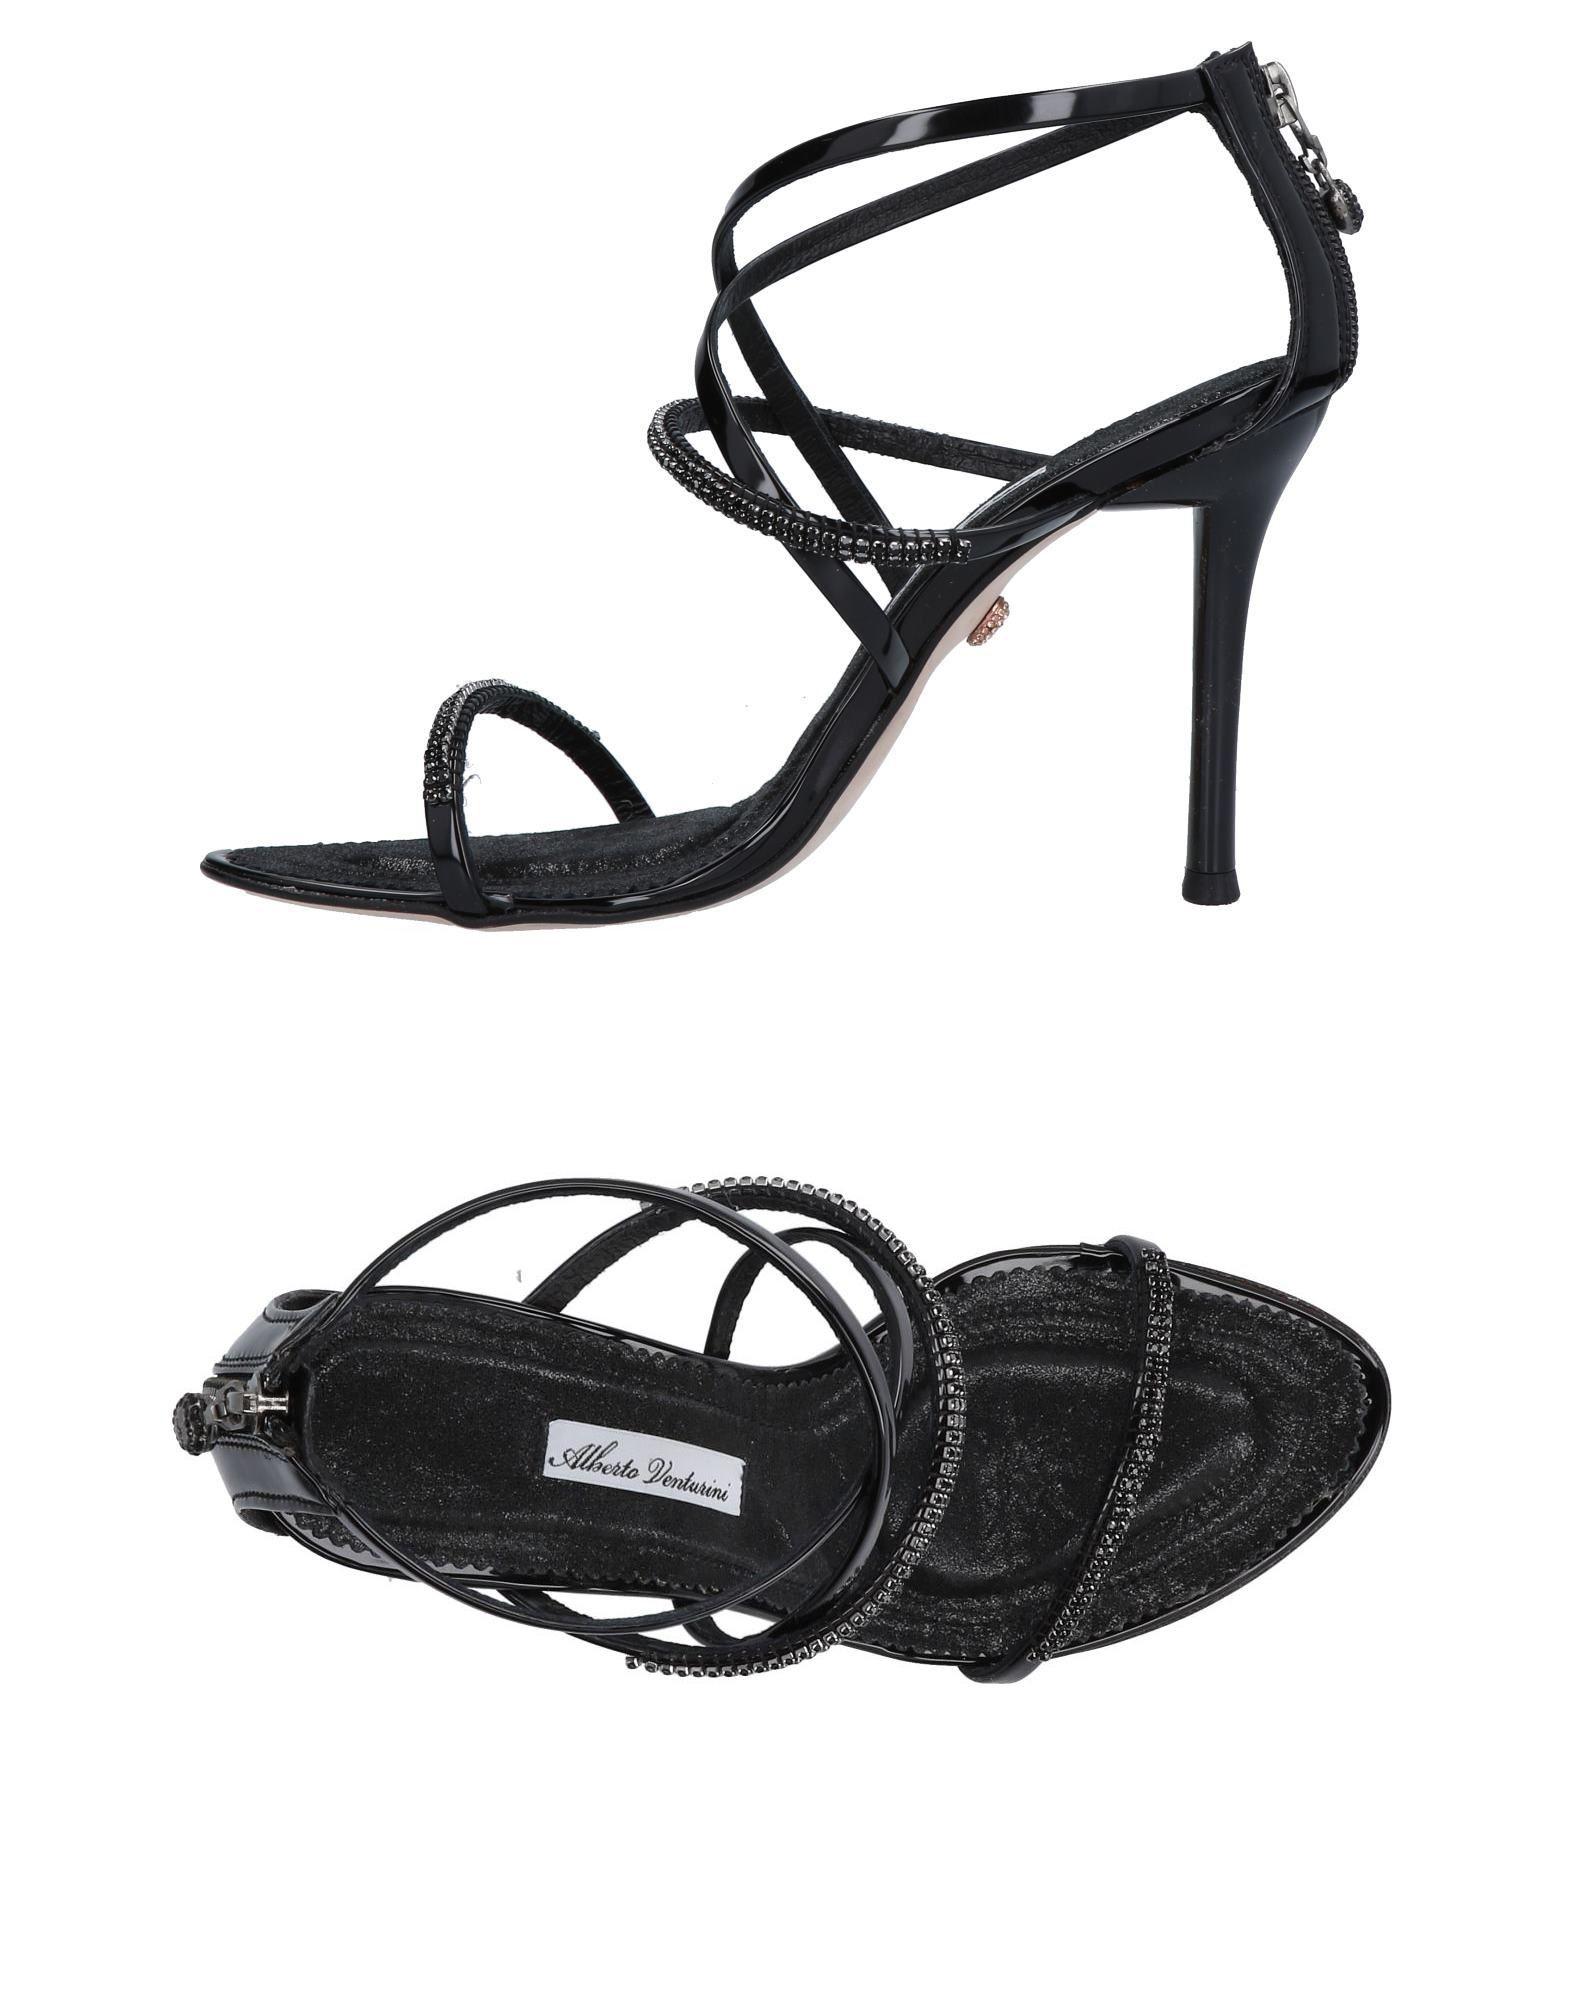 Alberto Venturini Sandals - Women Alberto Venturini Sandals online 11485936PM on  Australia - 11485936PM online b41f1b